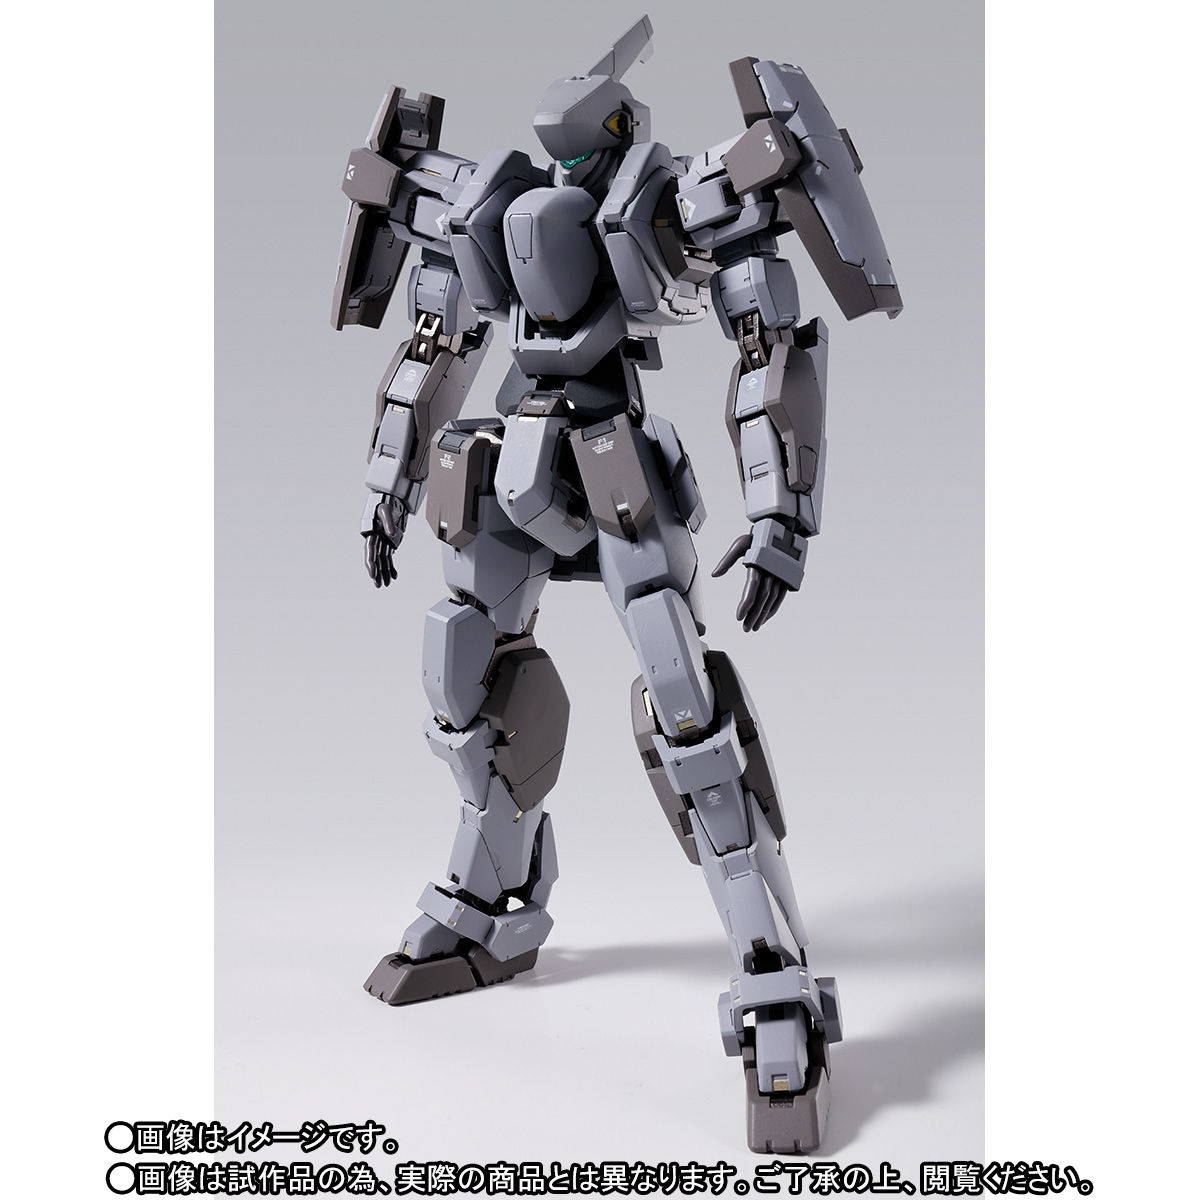 METAL BUILD『ガーンズバック Ver.IV|フルメタル・パニック!IV』可動フィギュア-004